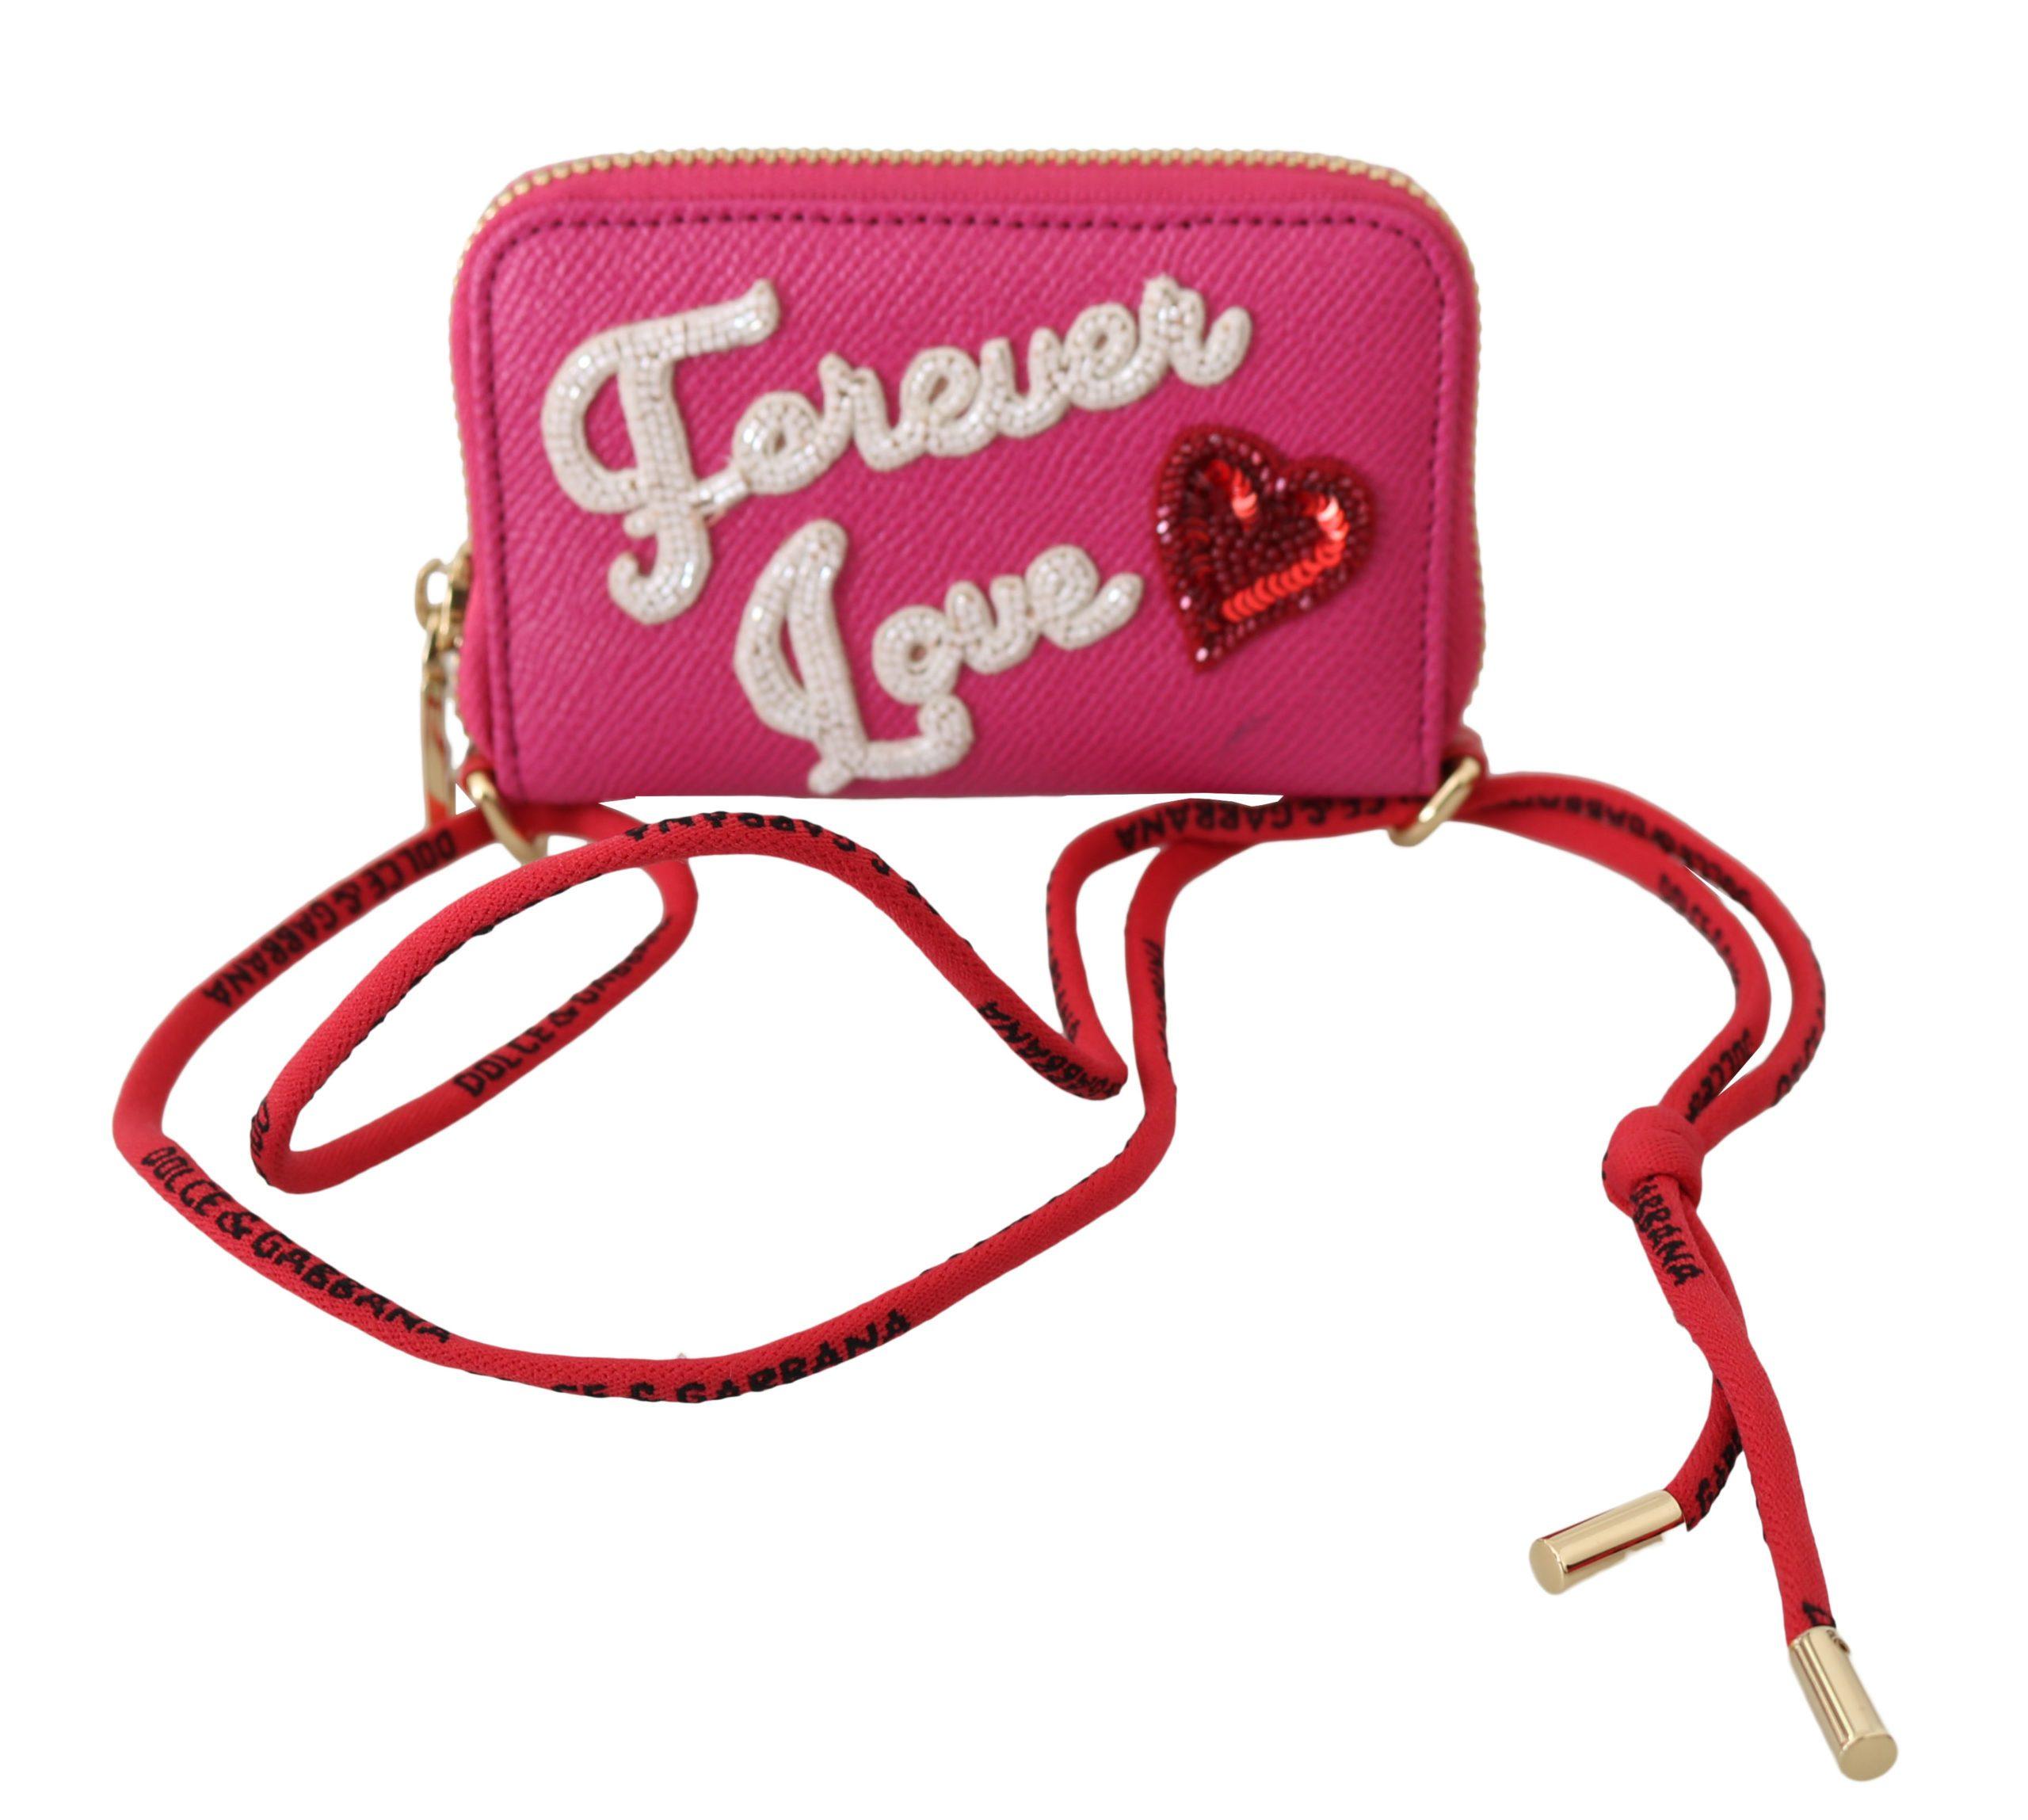 Dolce & Gabbana Women's Forever Love Zipper Leather Wallet Pink VA8736